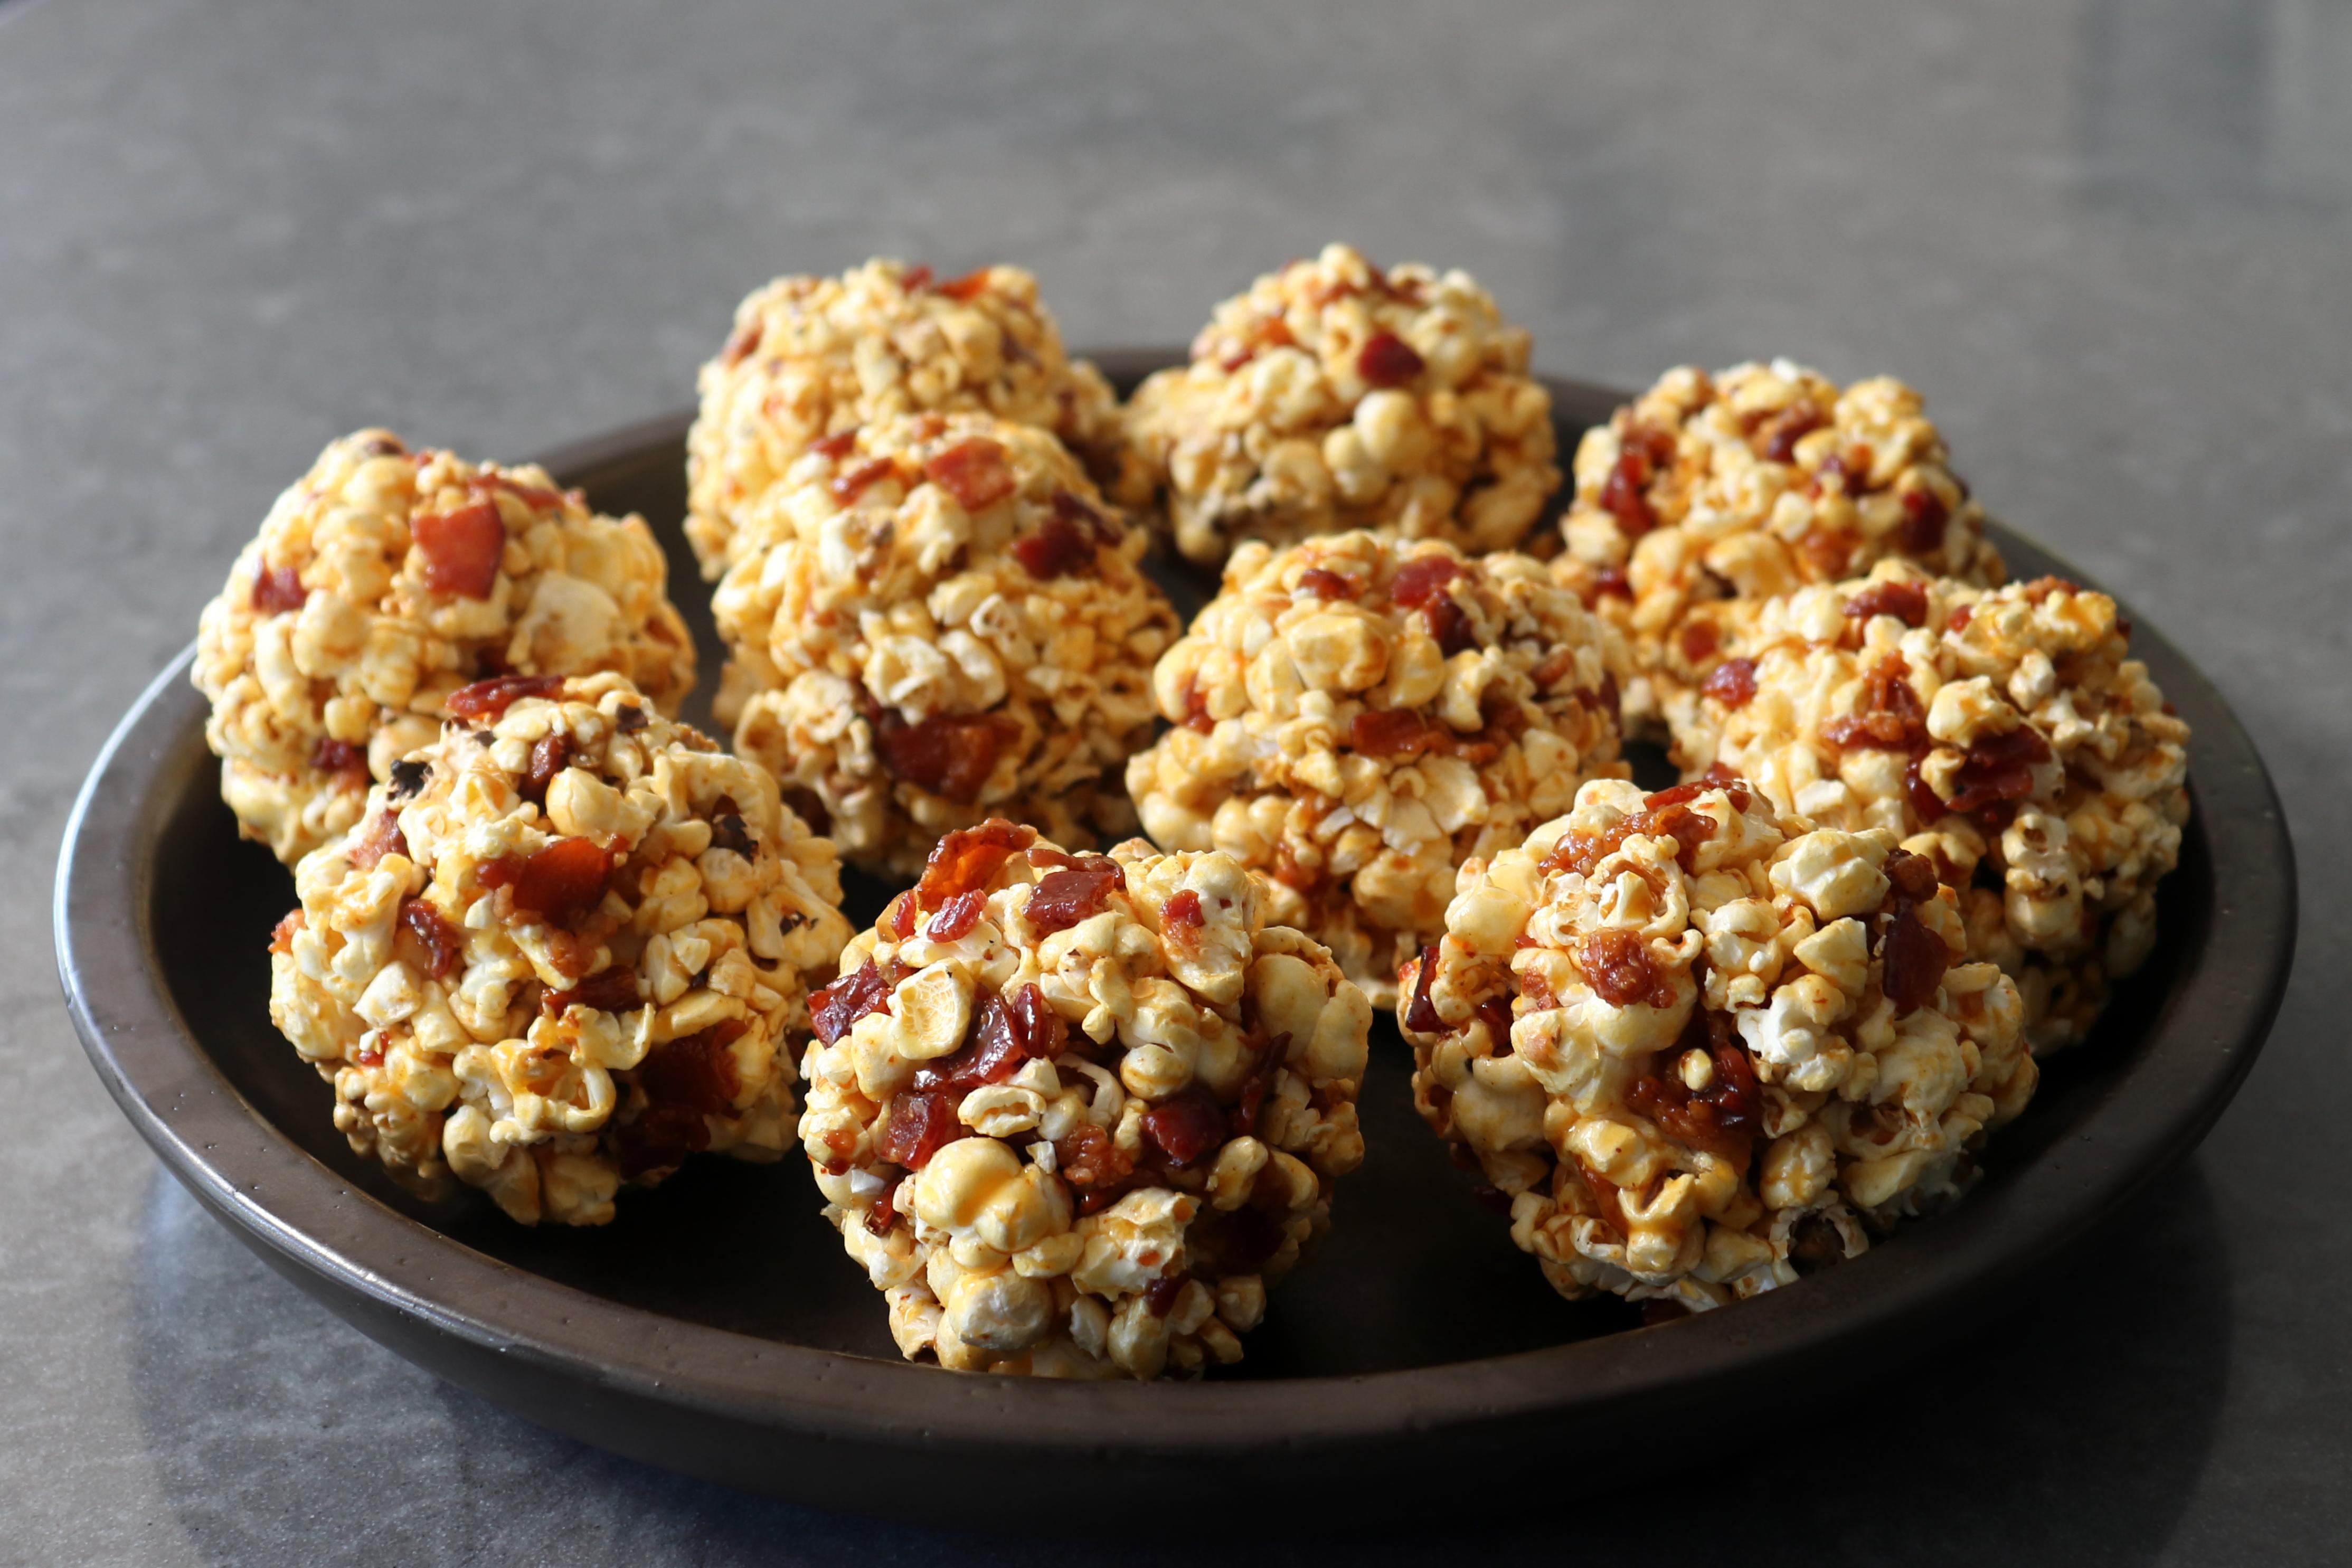 Bacon-Caramel Popcorn Balls